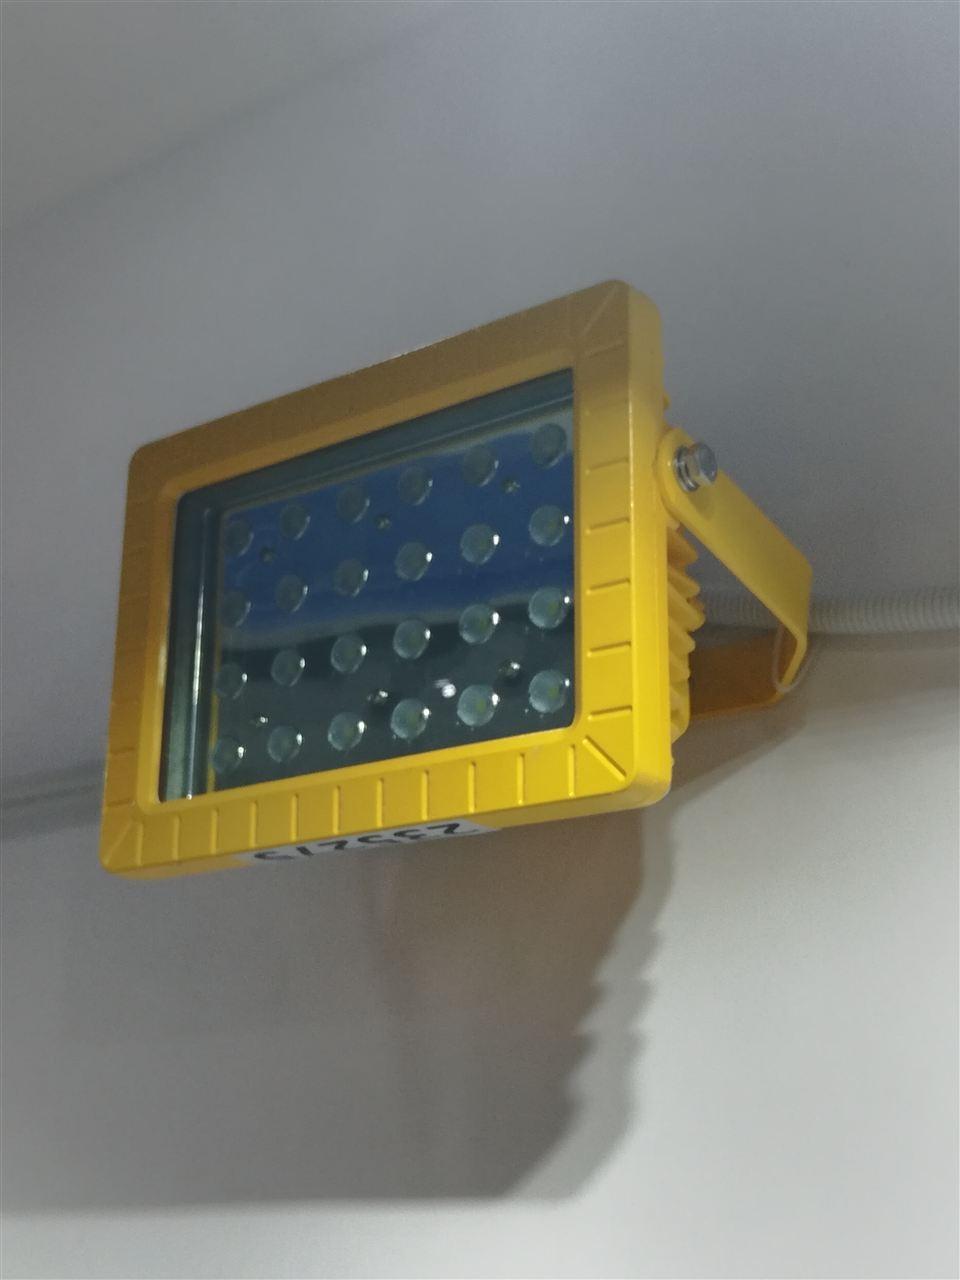 防爆灯(壁装)70W LED光源 220V电压 syfb97